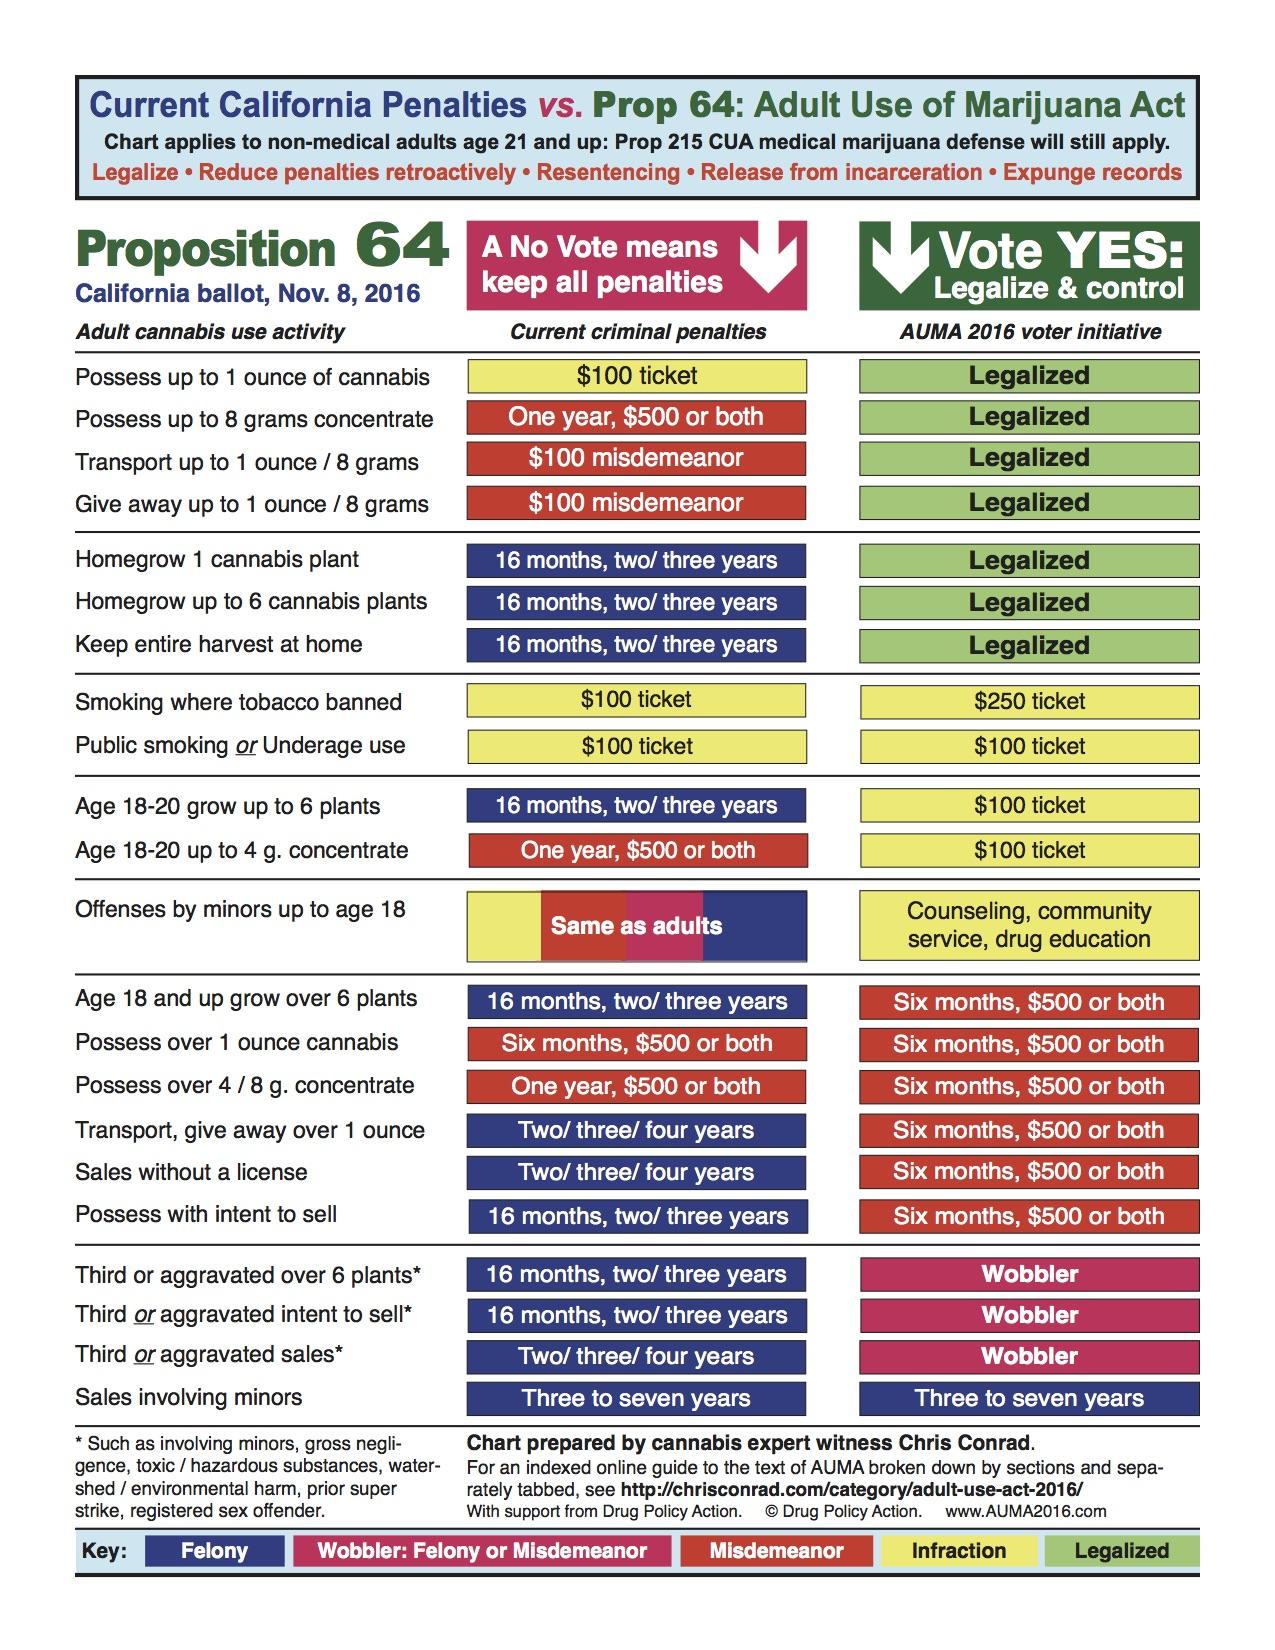 Prop 64 Penalty Chart